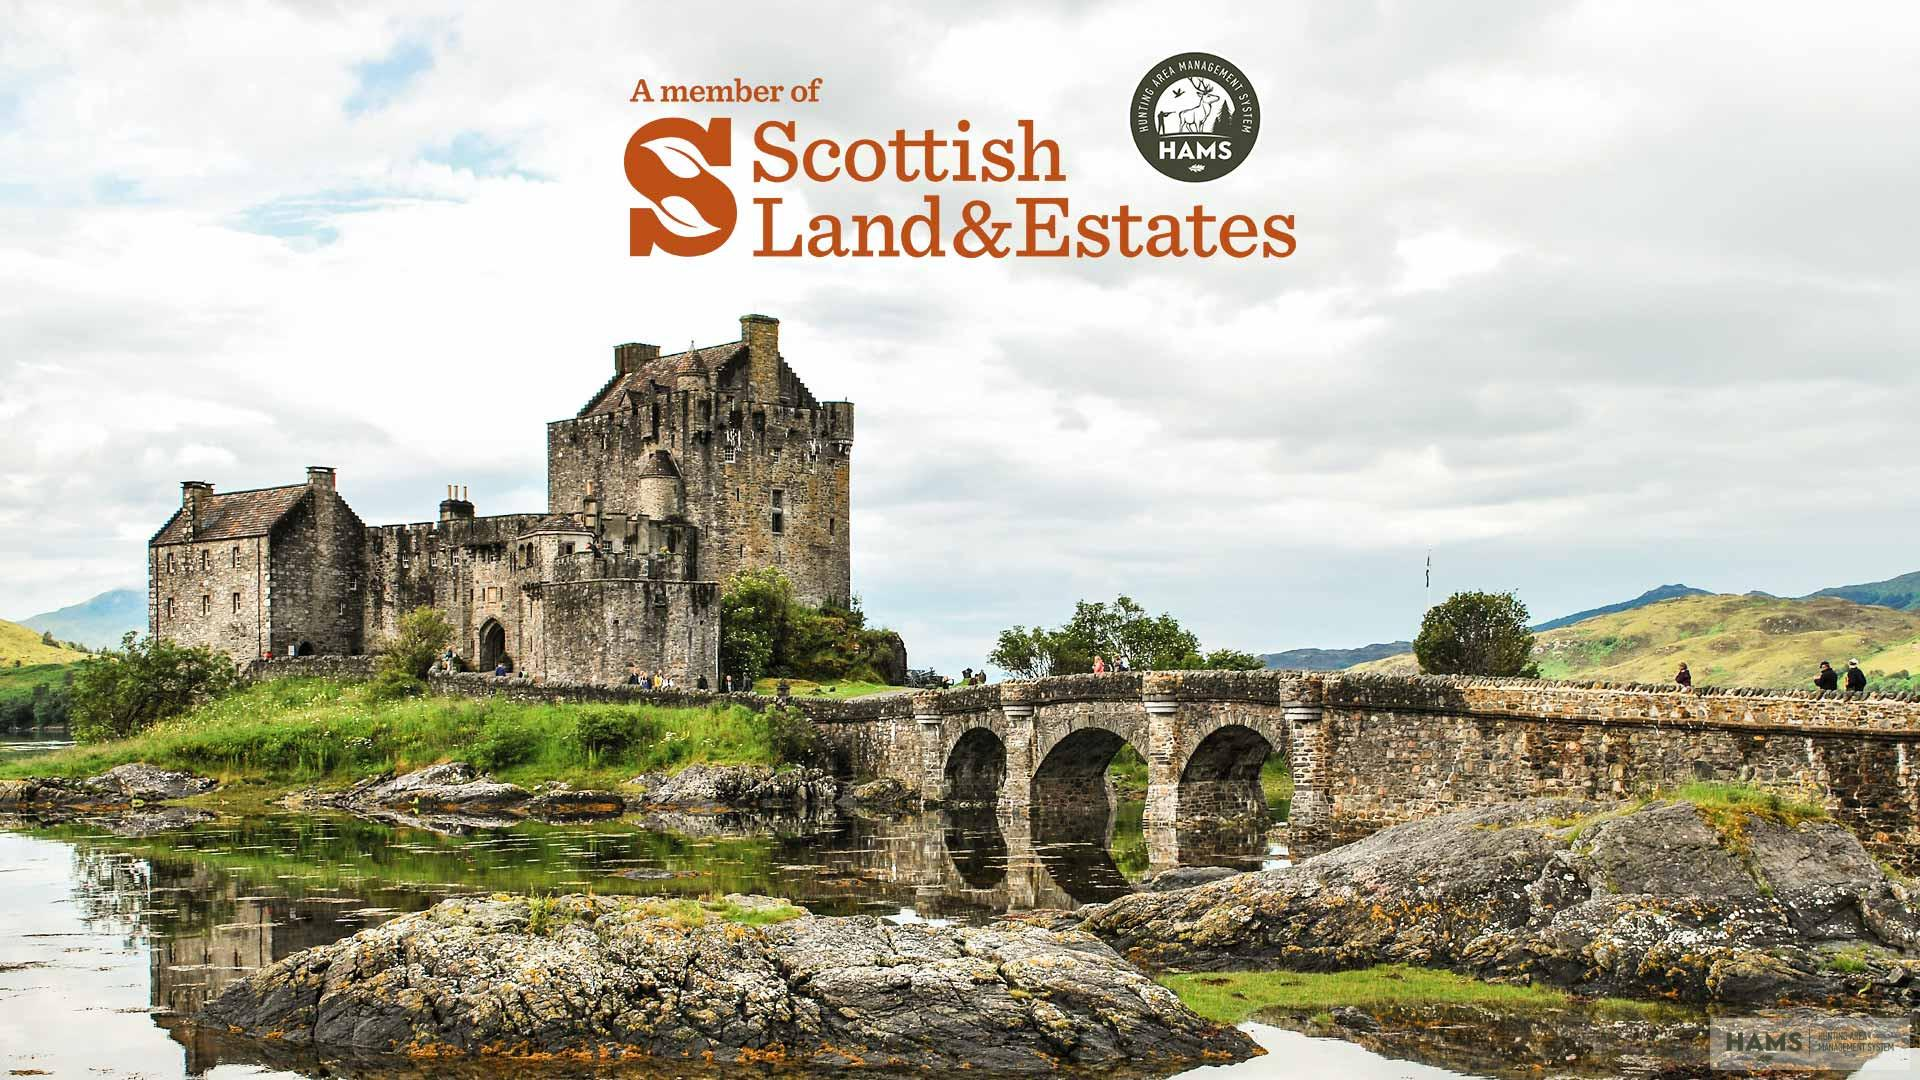 HAMS + Scottish Land & Estates